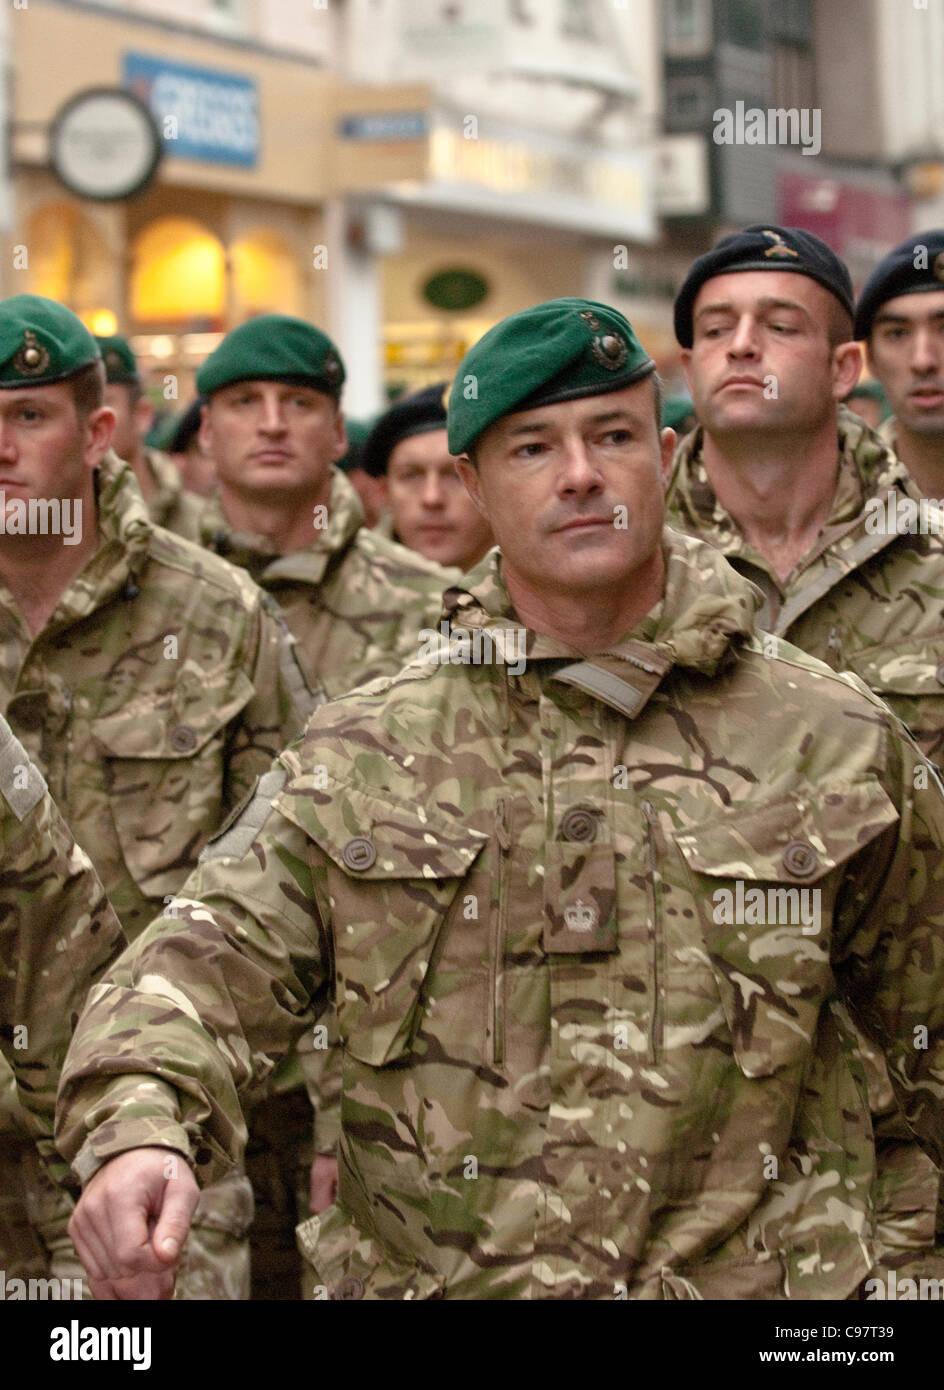 Register for the Royal Navy forum